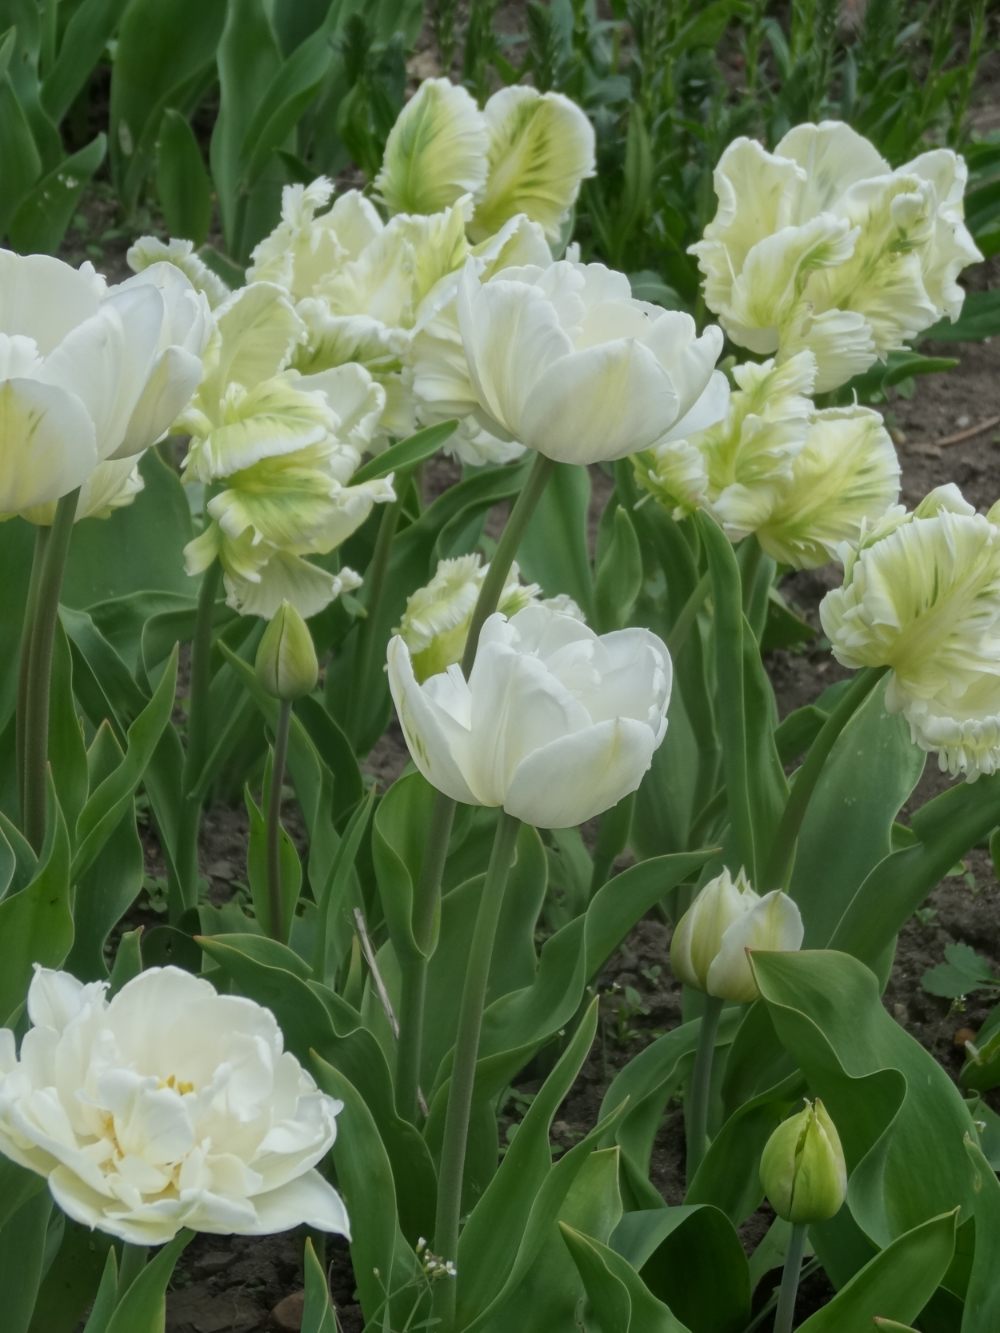 April flowers 15 034.jpg